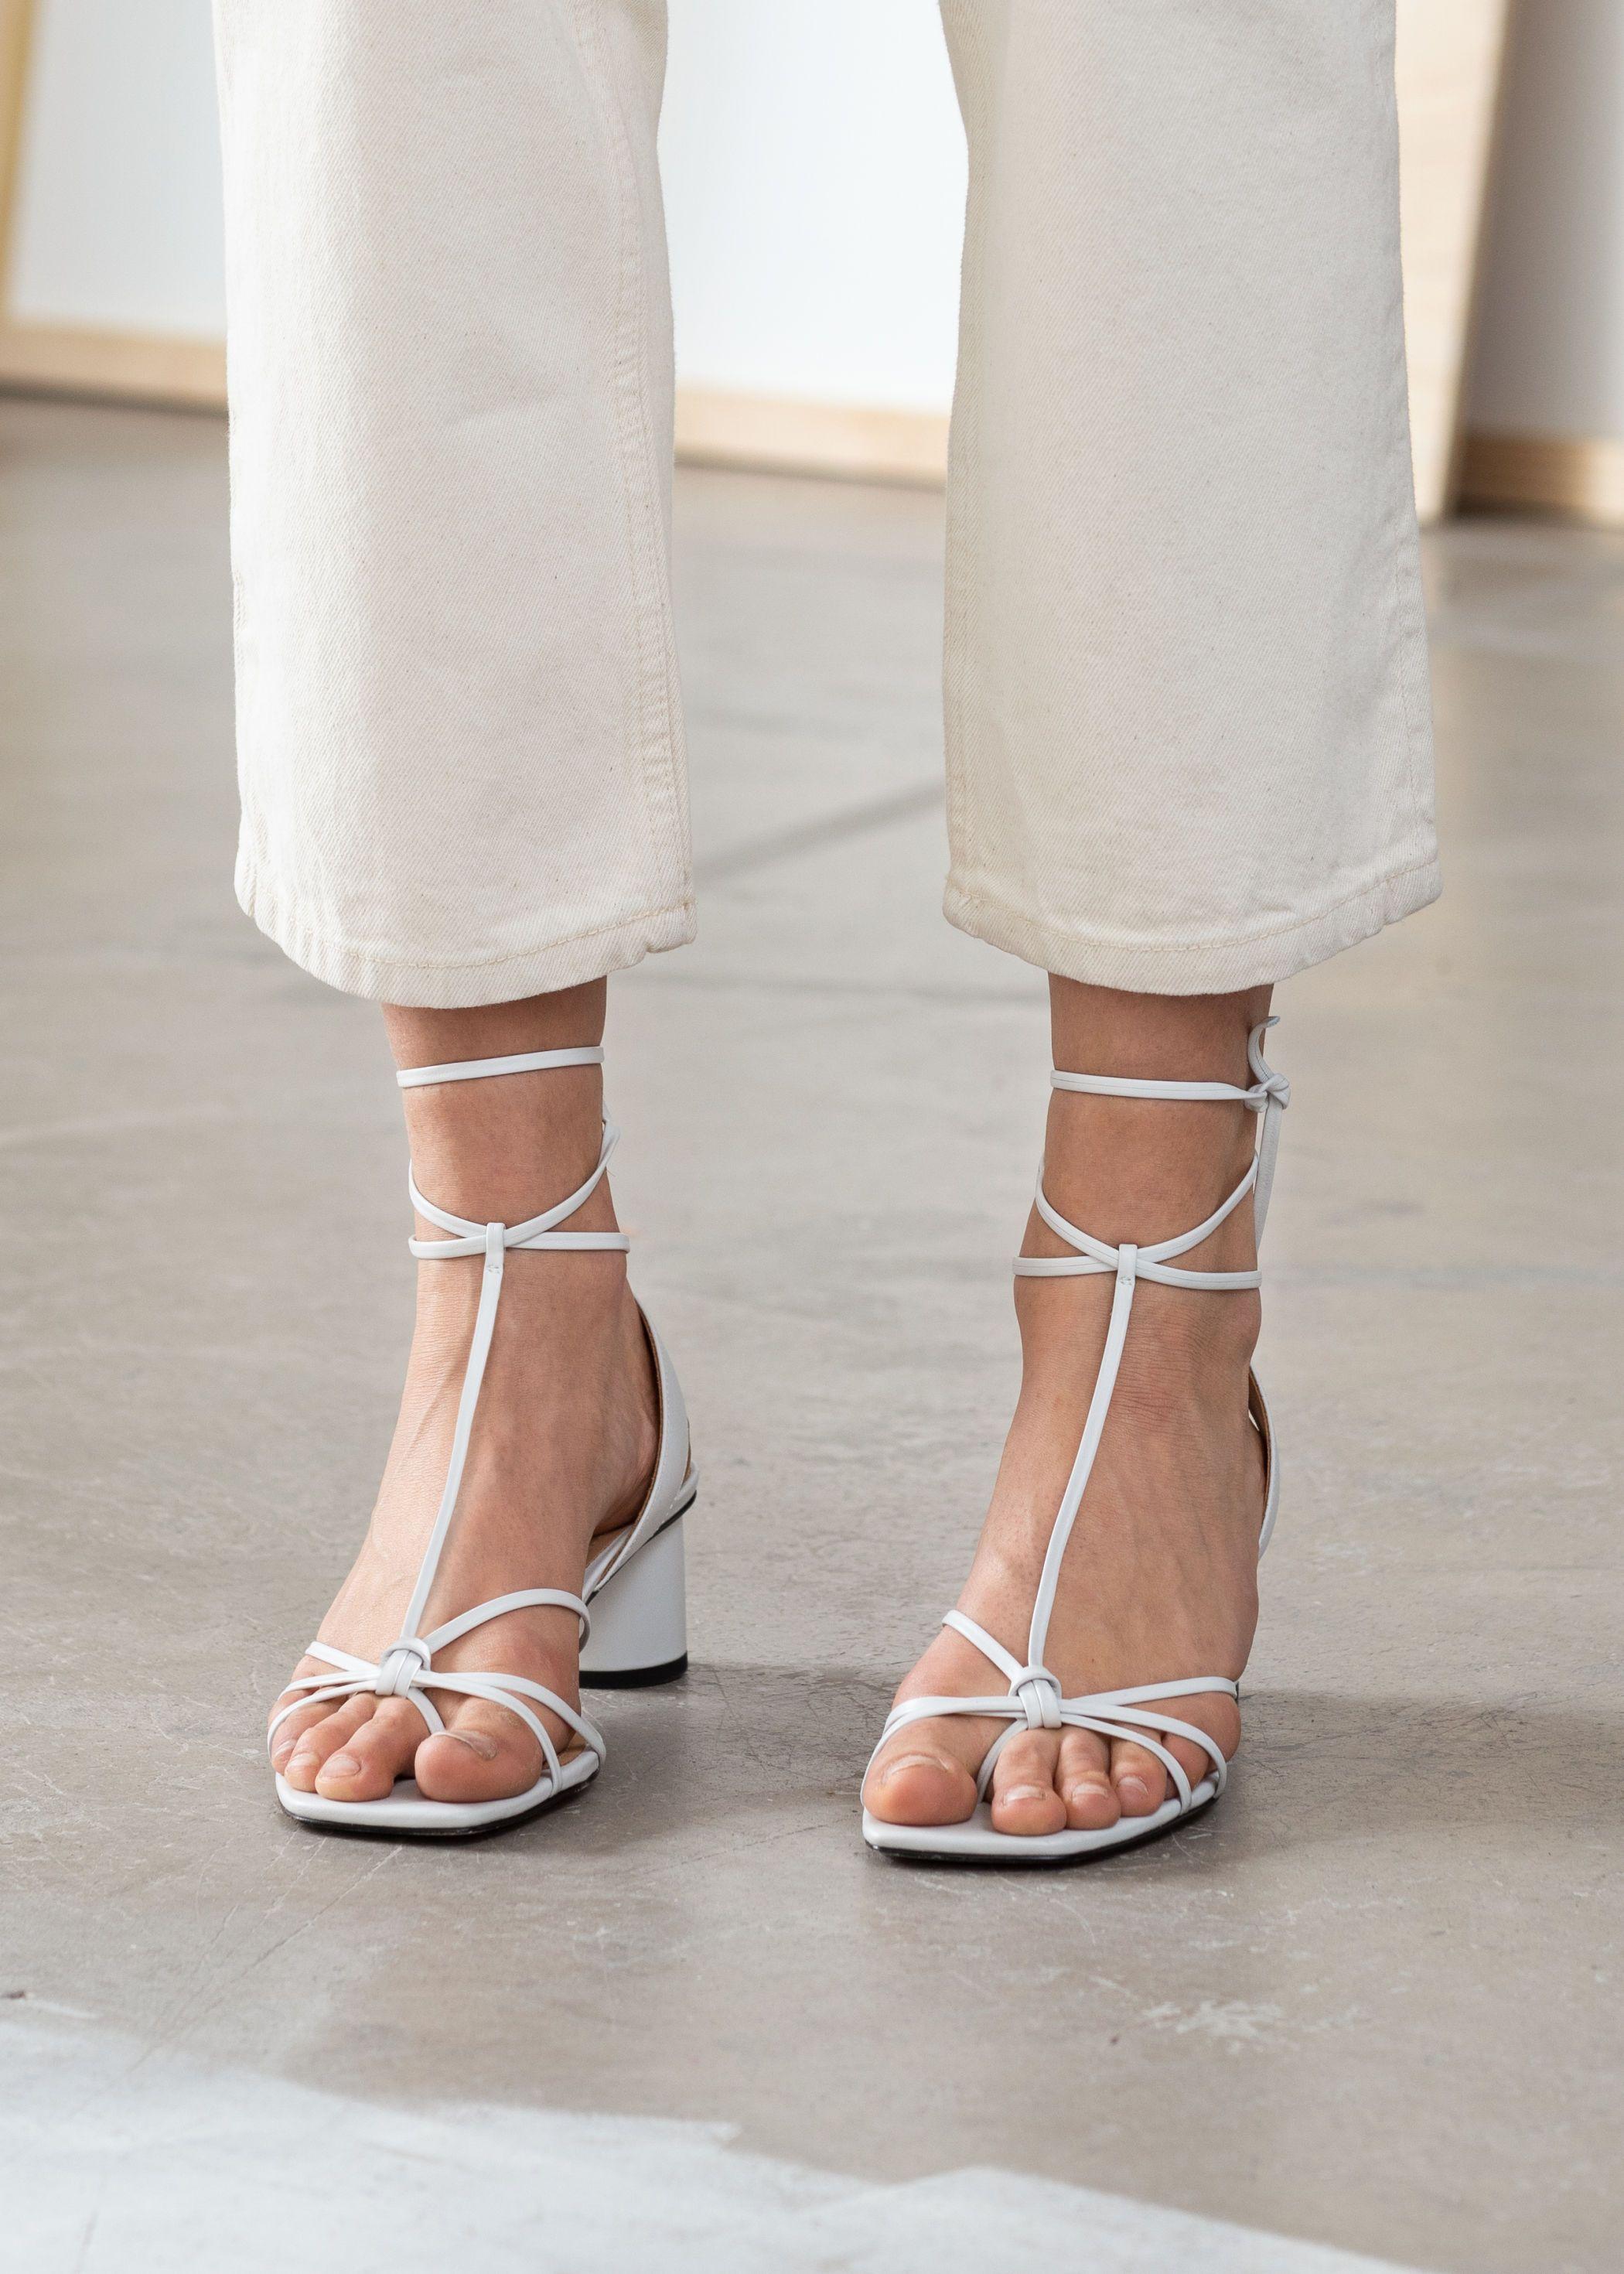 Square toe heels